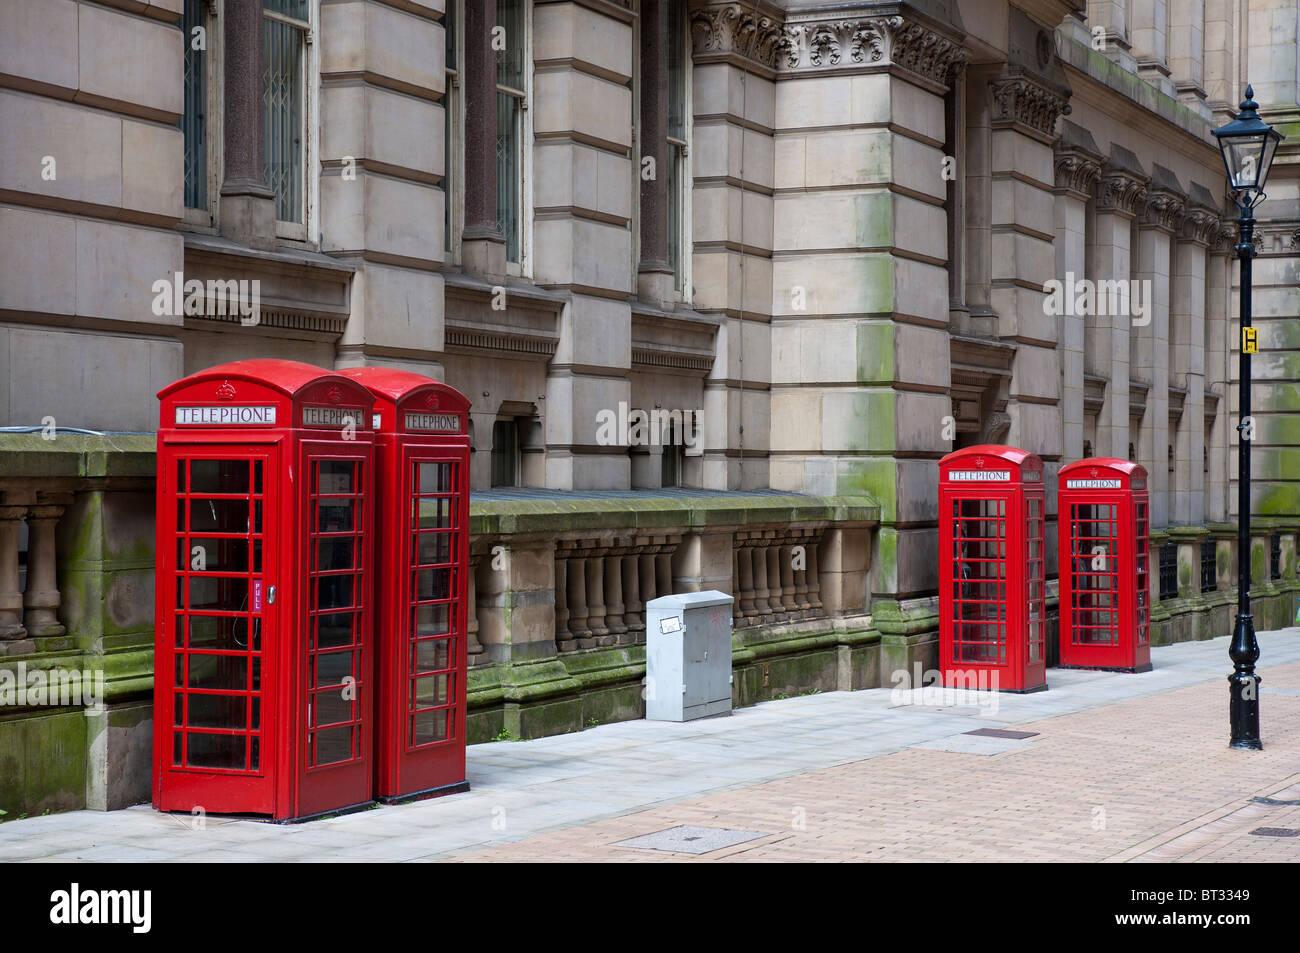 Telephome Kiosks in Eden Place, Birmingham City Centre, Birmingham, West Midlands, England, UK. - Stock Image